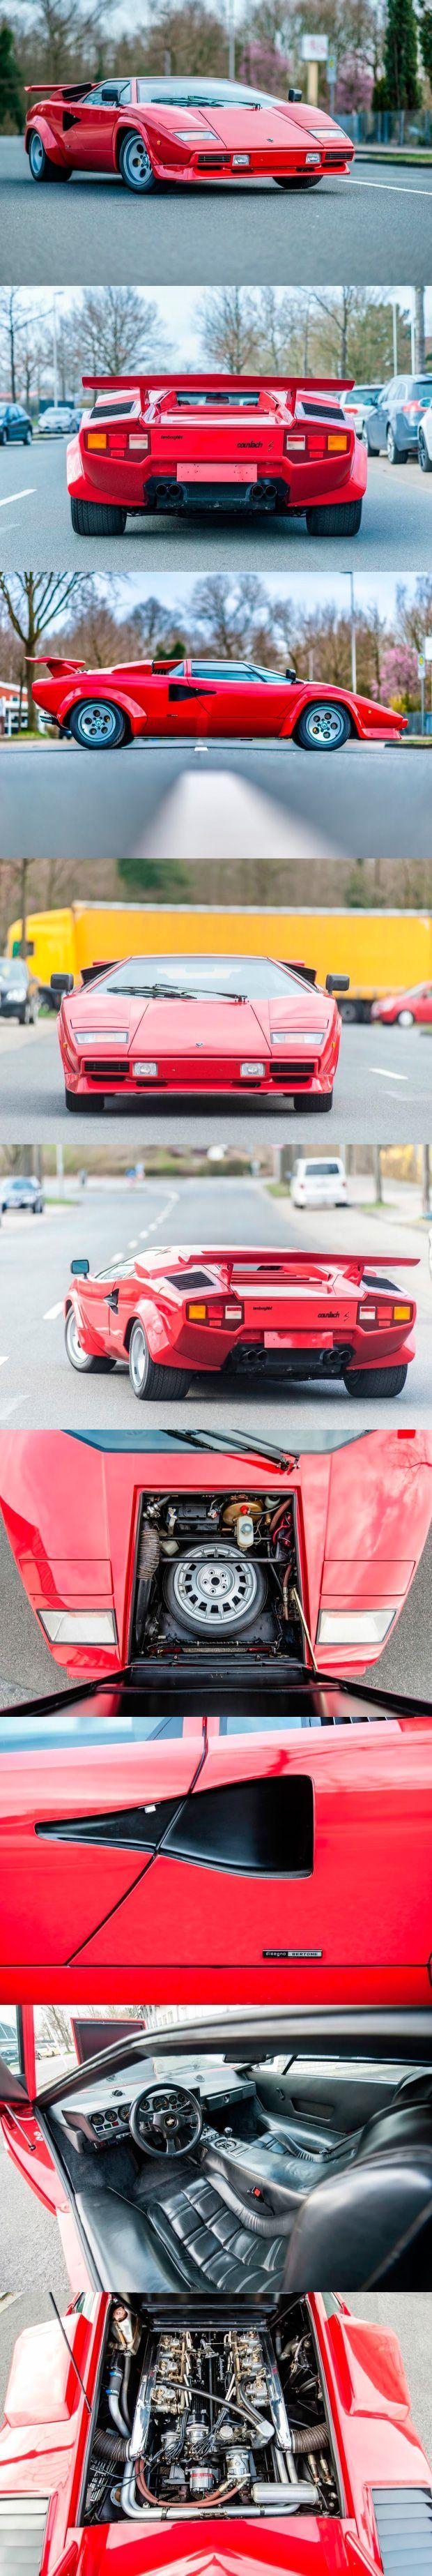 84b098fb200e32274ab114d46c95849c Astounding Lamborghini Countach Built In Basement Cars Trend